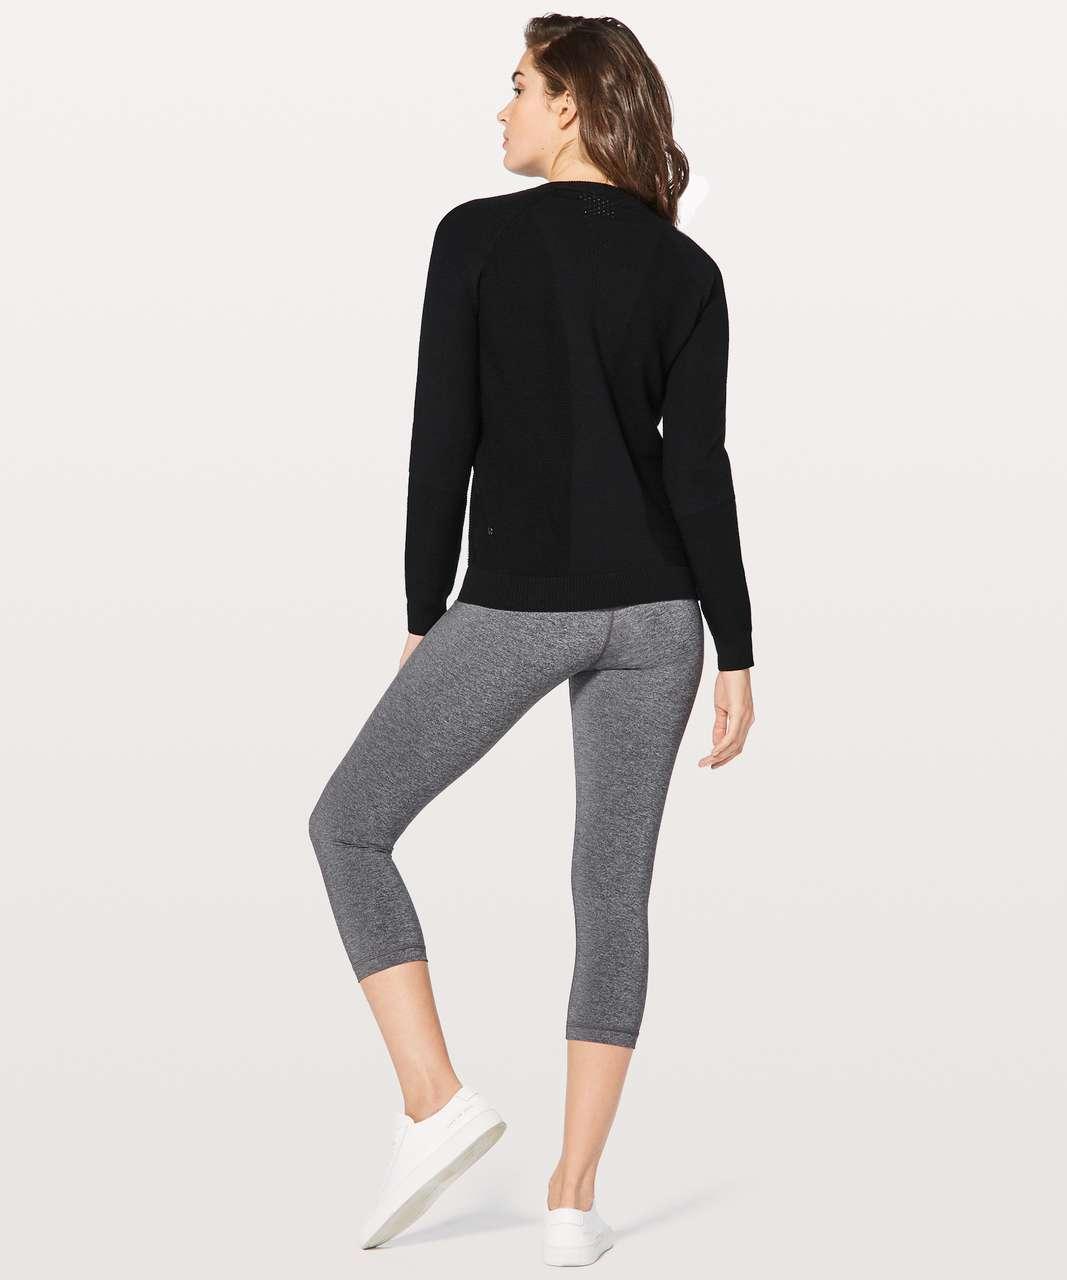 Lululemon Simply Wool Sweater - Black